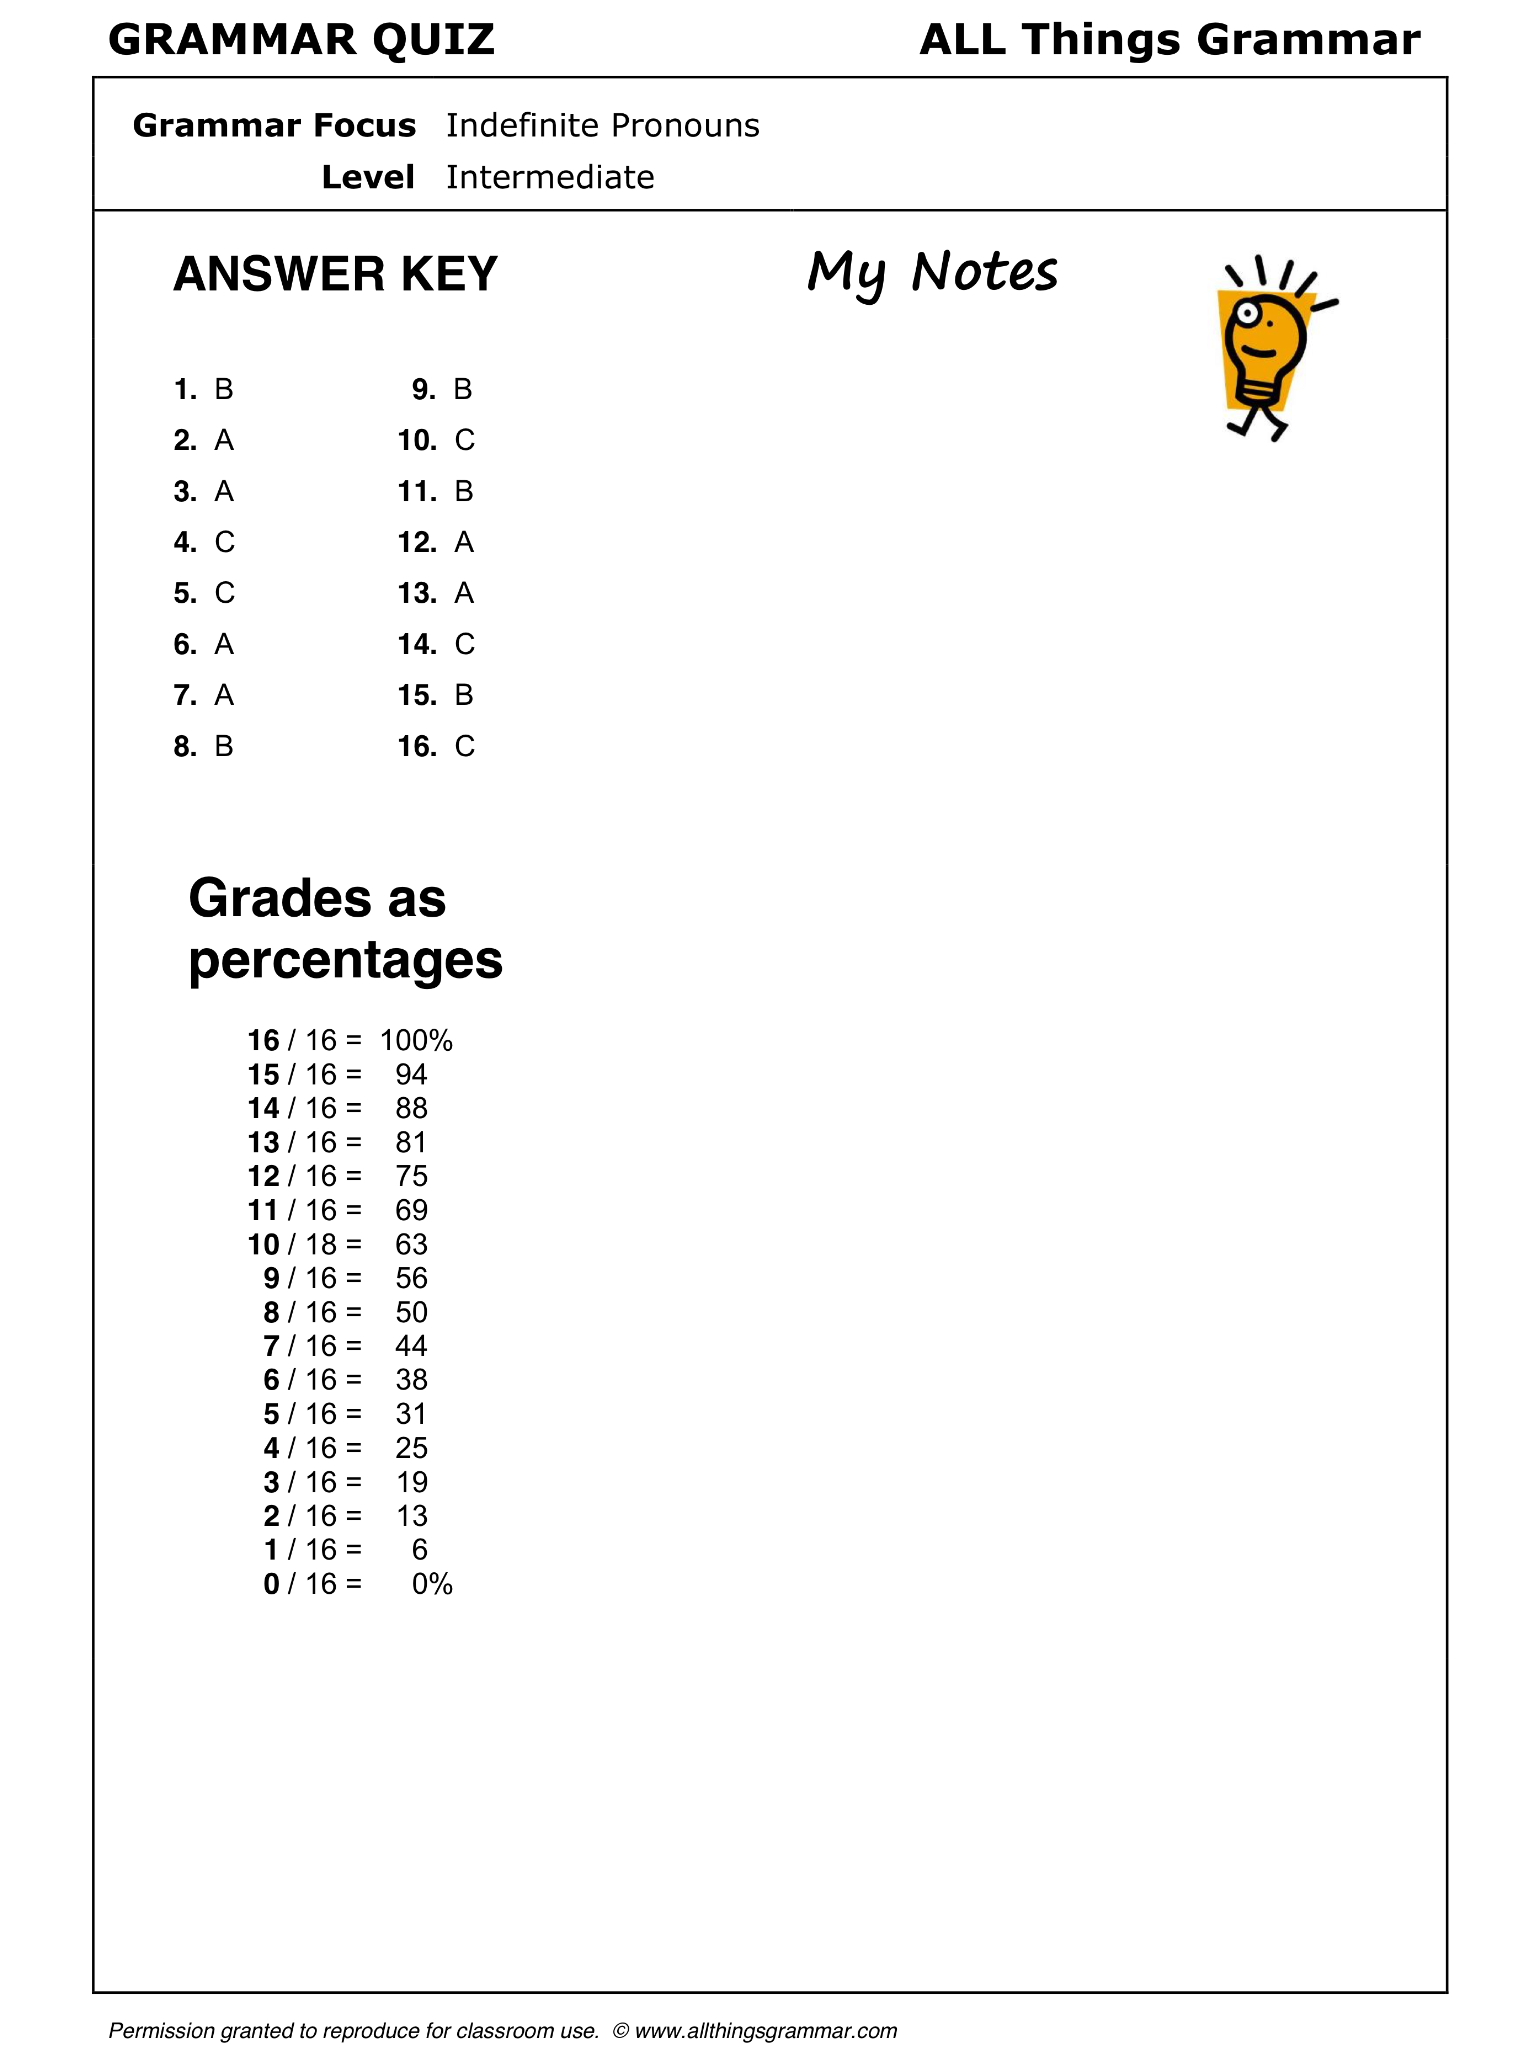 Worksheets Indefinite Pronouns Worksheet english grammar quiz indefinite pronouns httpwww allthingsgrammar com indefinite